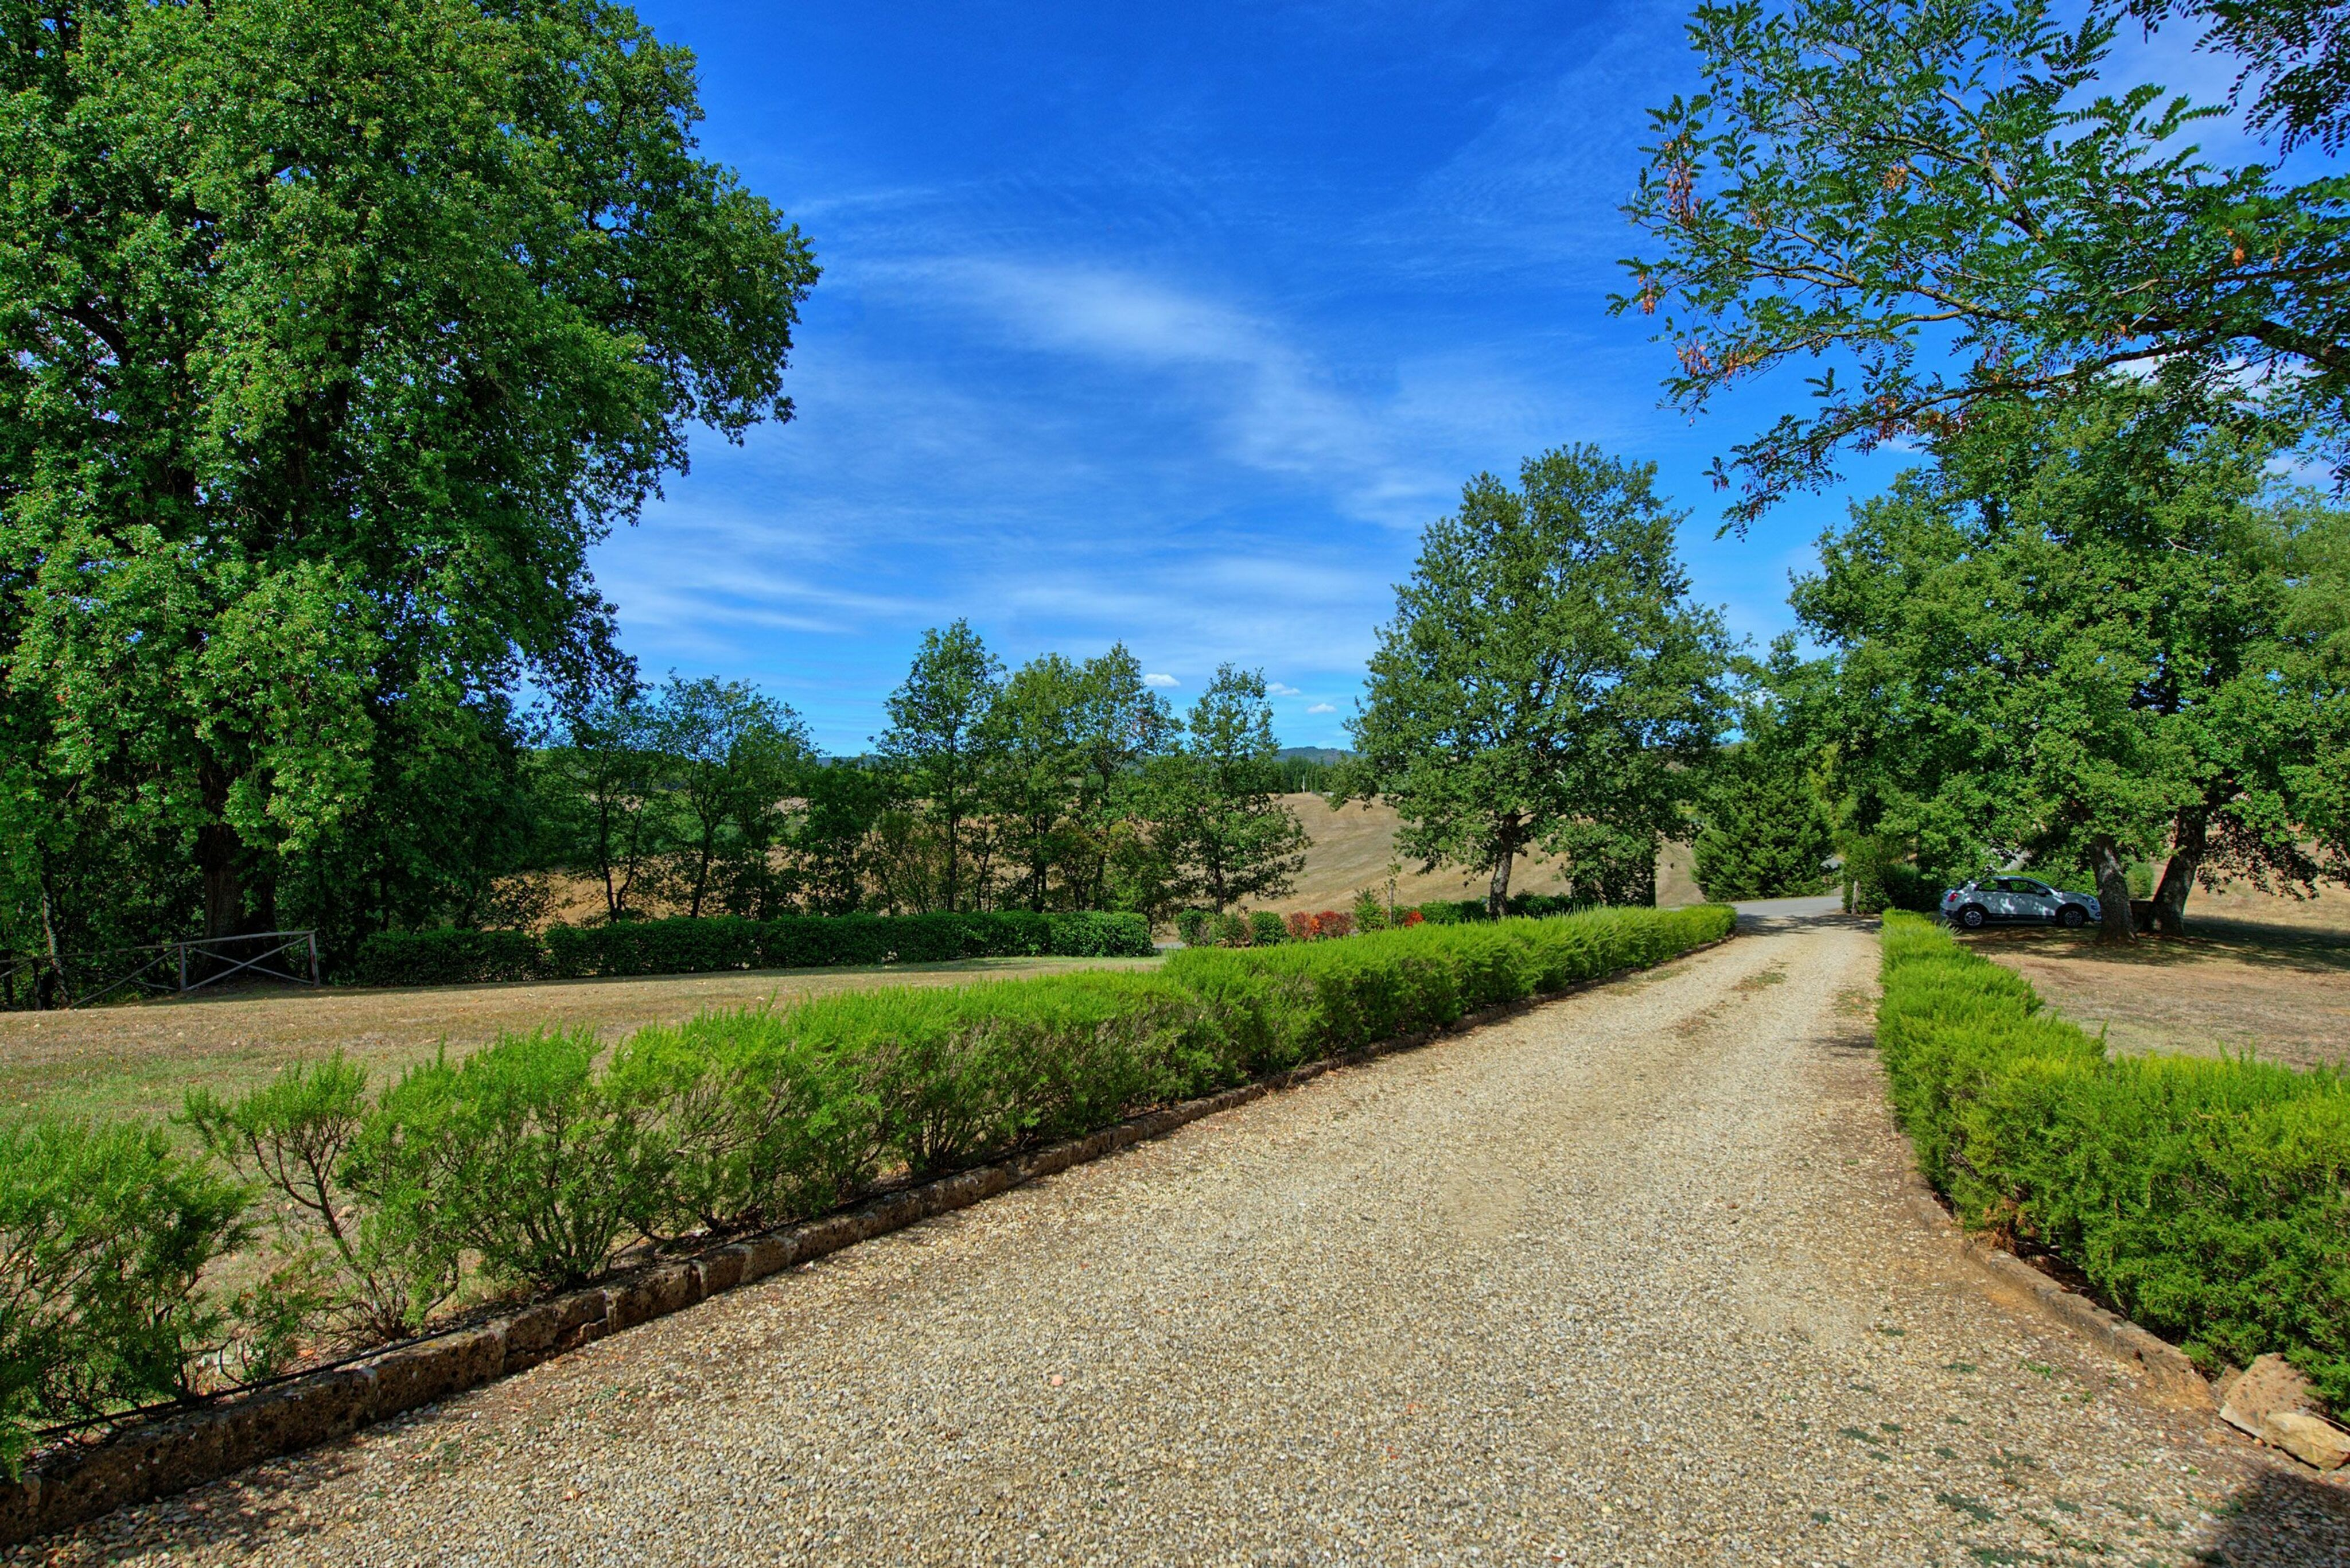 Villa Fabbriimage 39